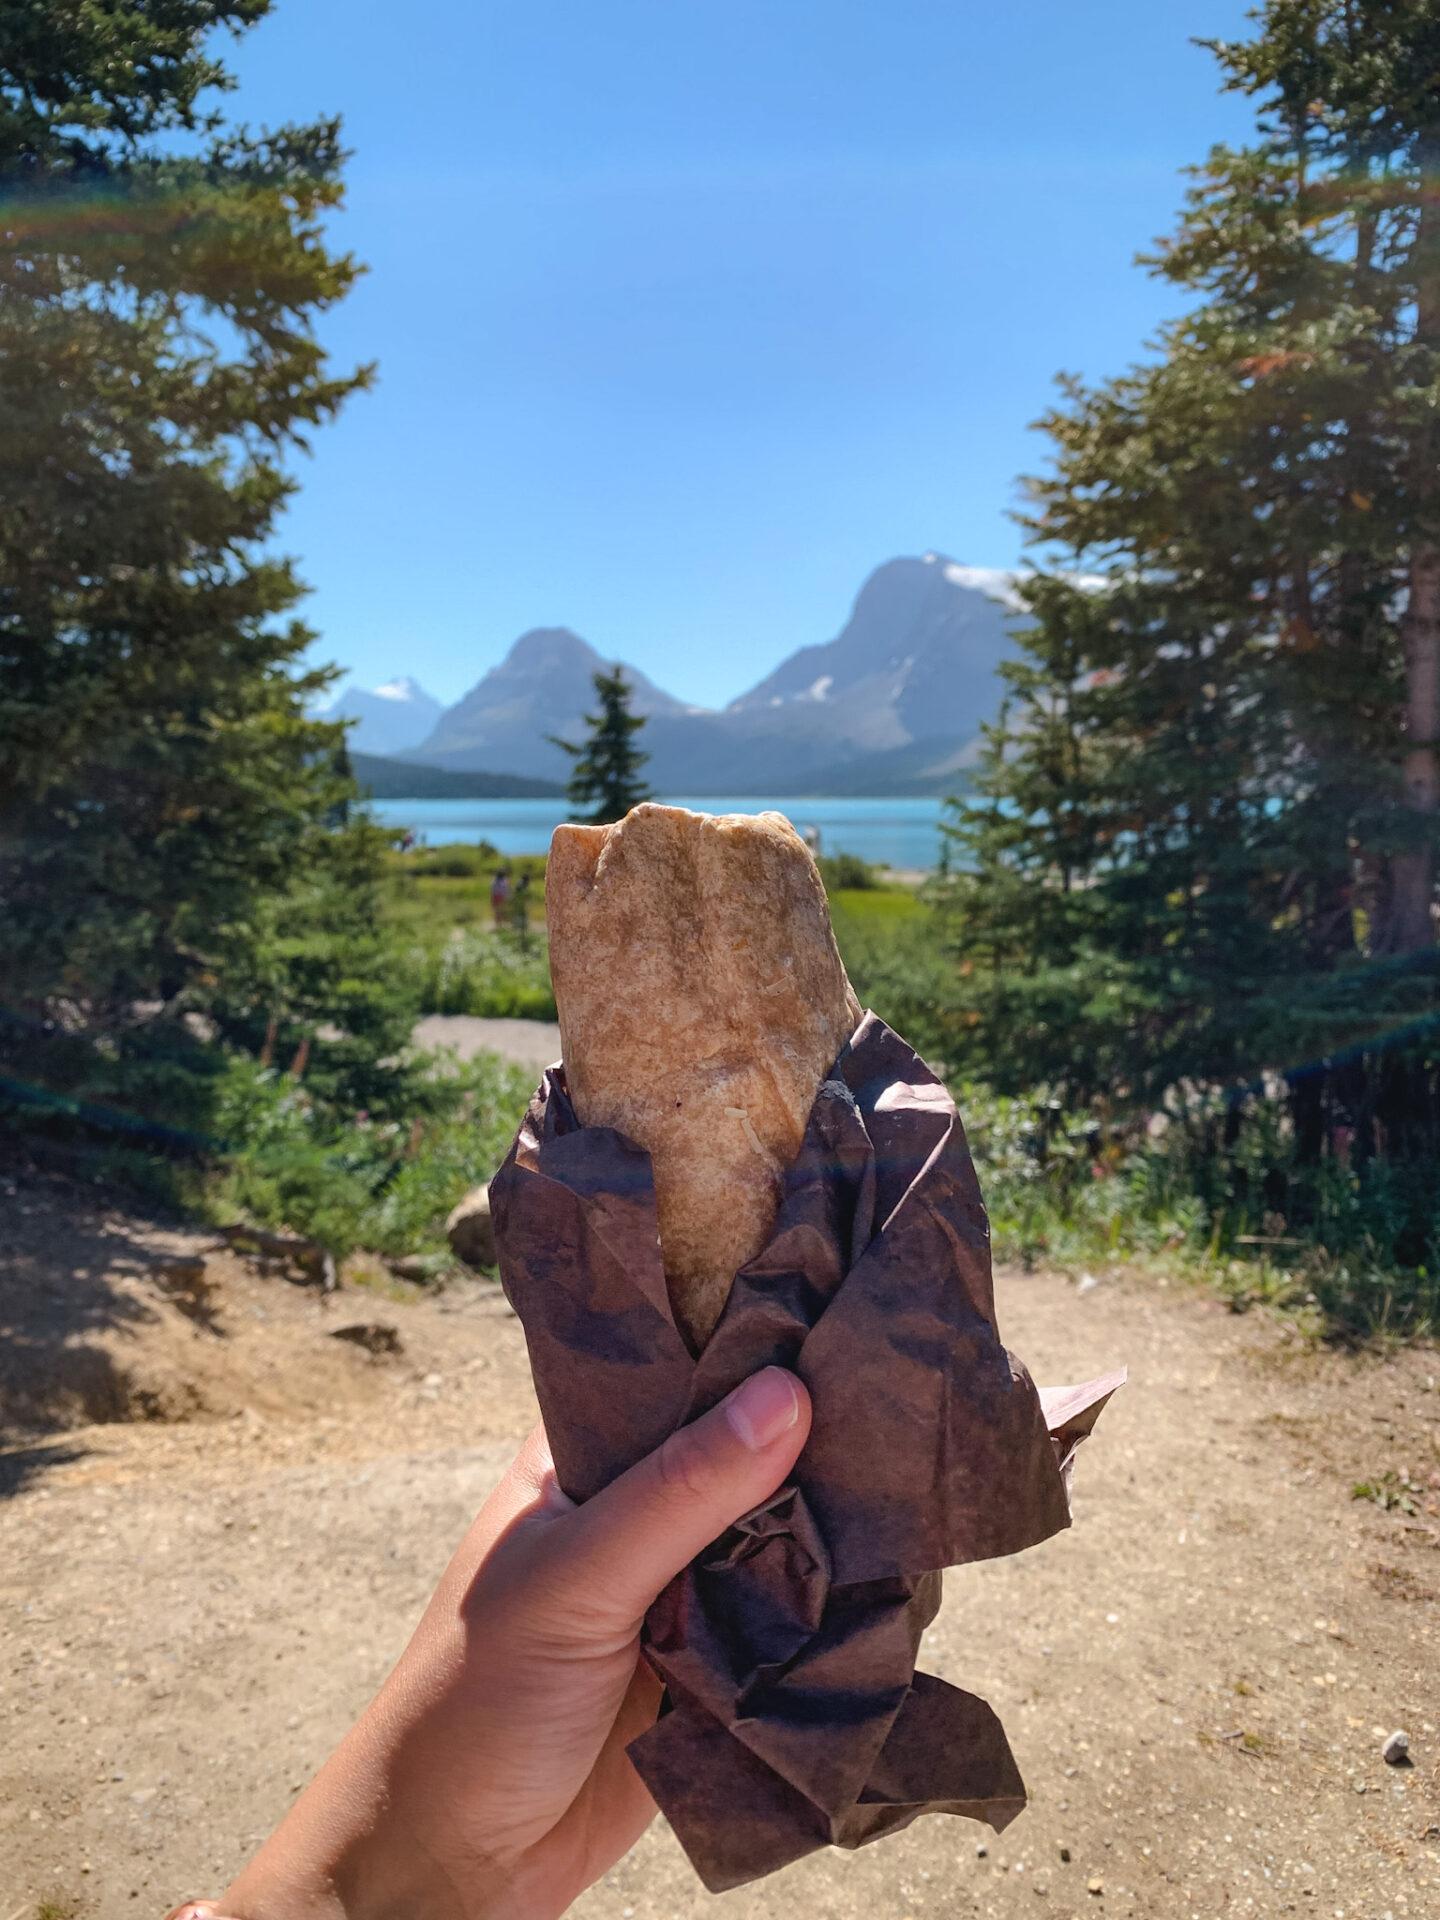 Cajun Chicken Caesar Salad Wrap from Trailhead Café at Bow Lake in Banff, Alberta